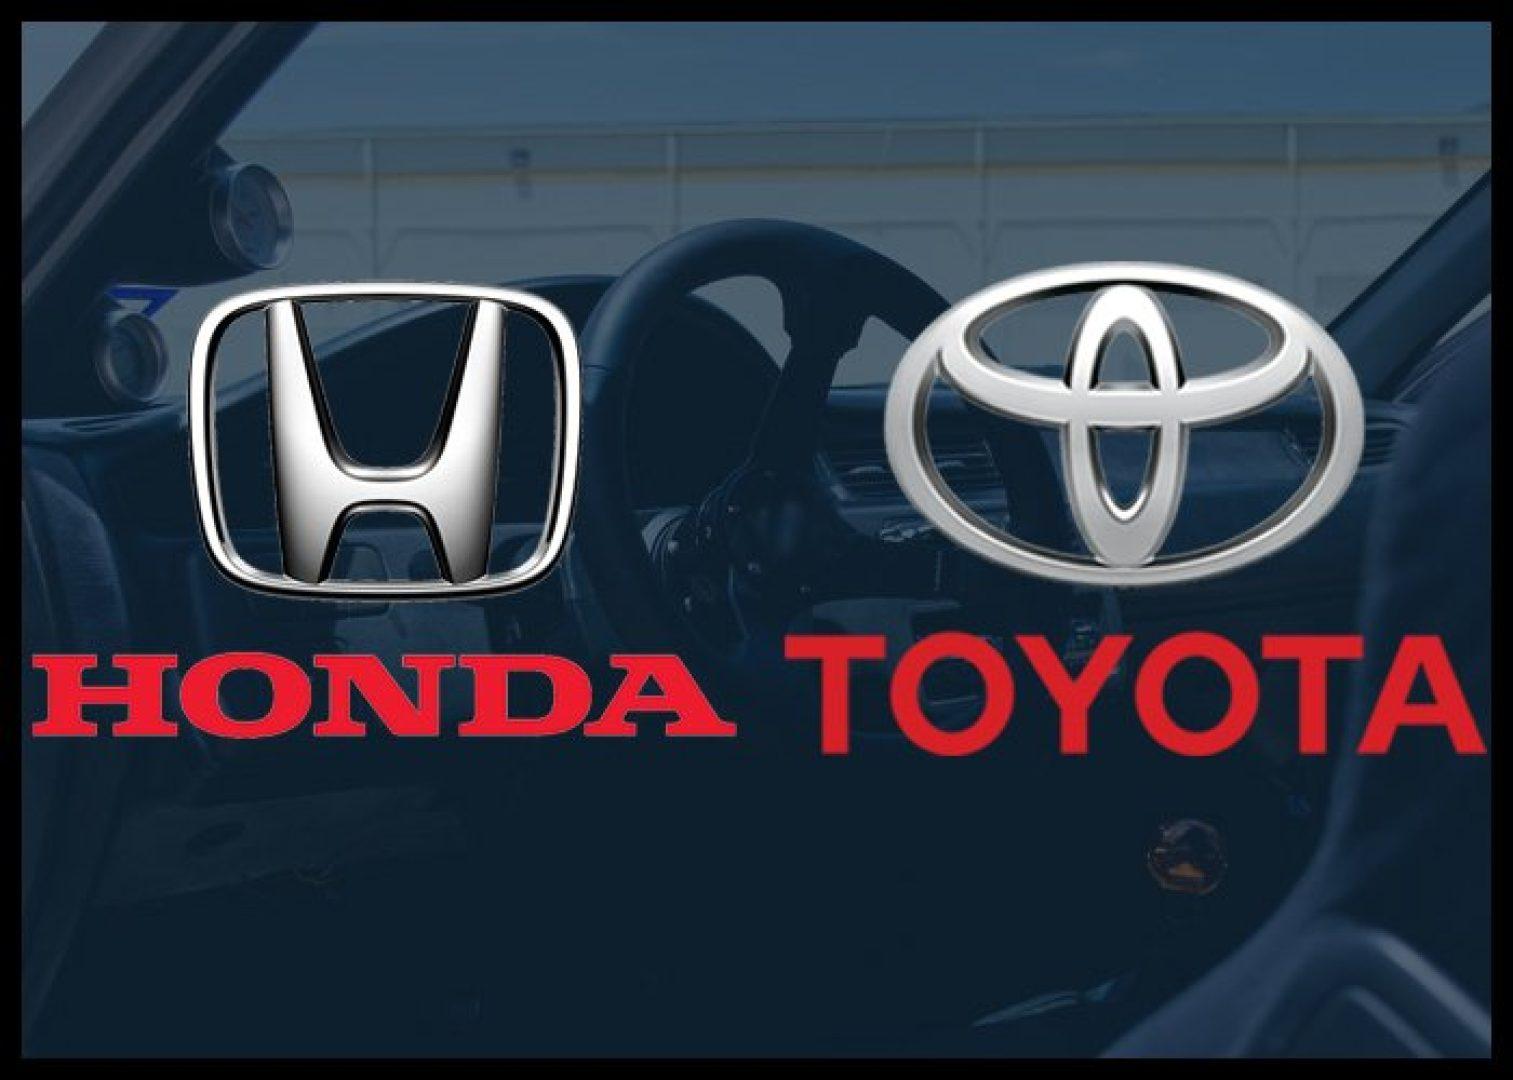 Honda Toyota